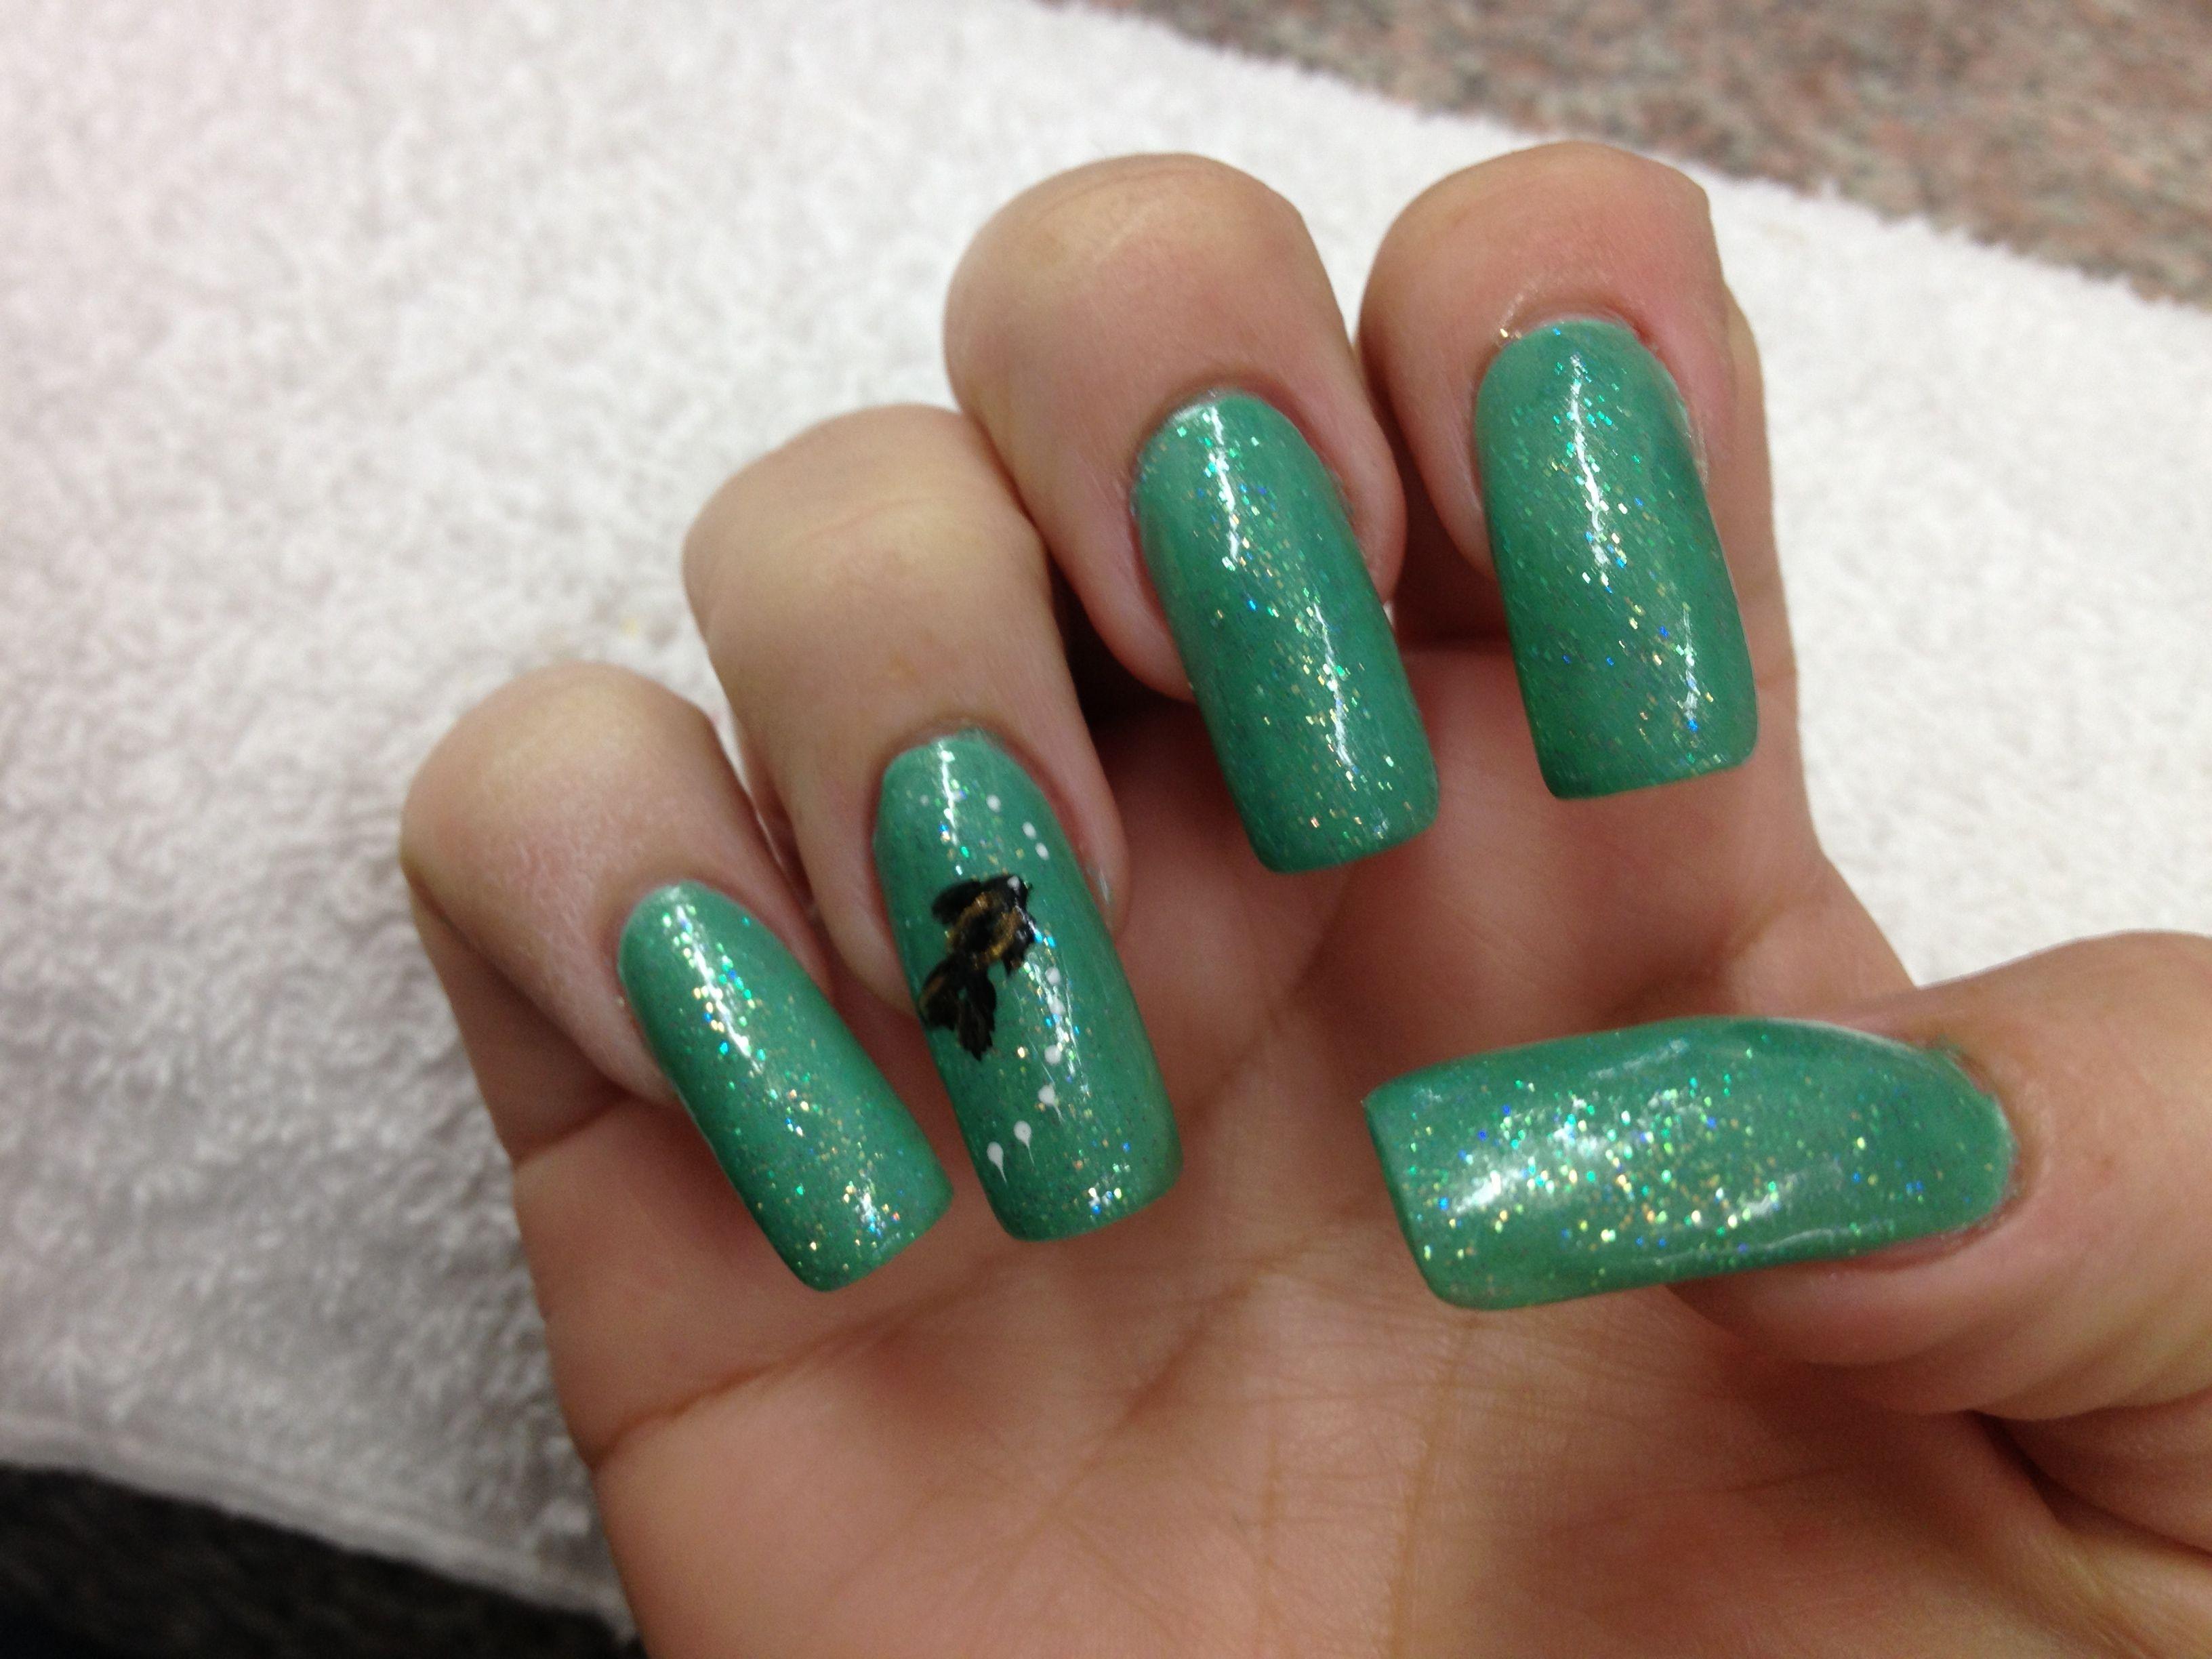 Teal Fish design | Nail designs | Pinterest